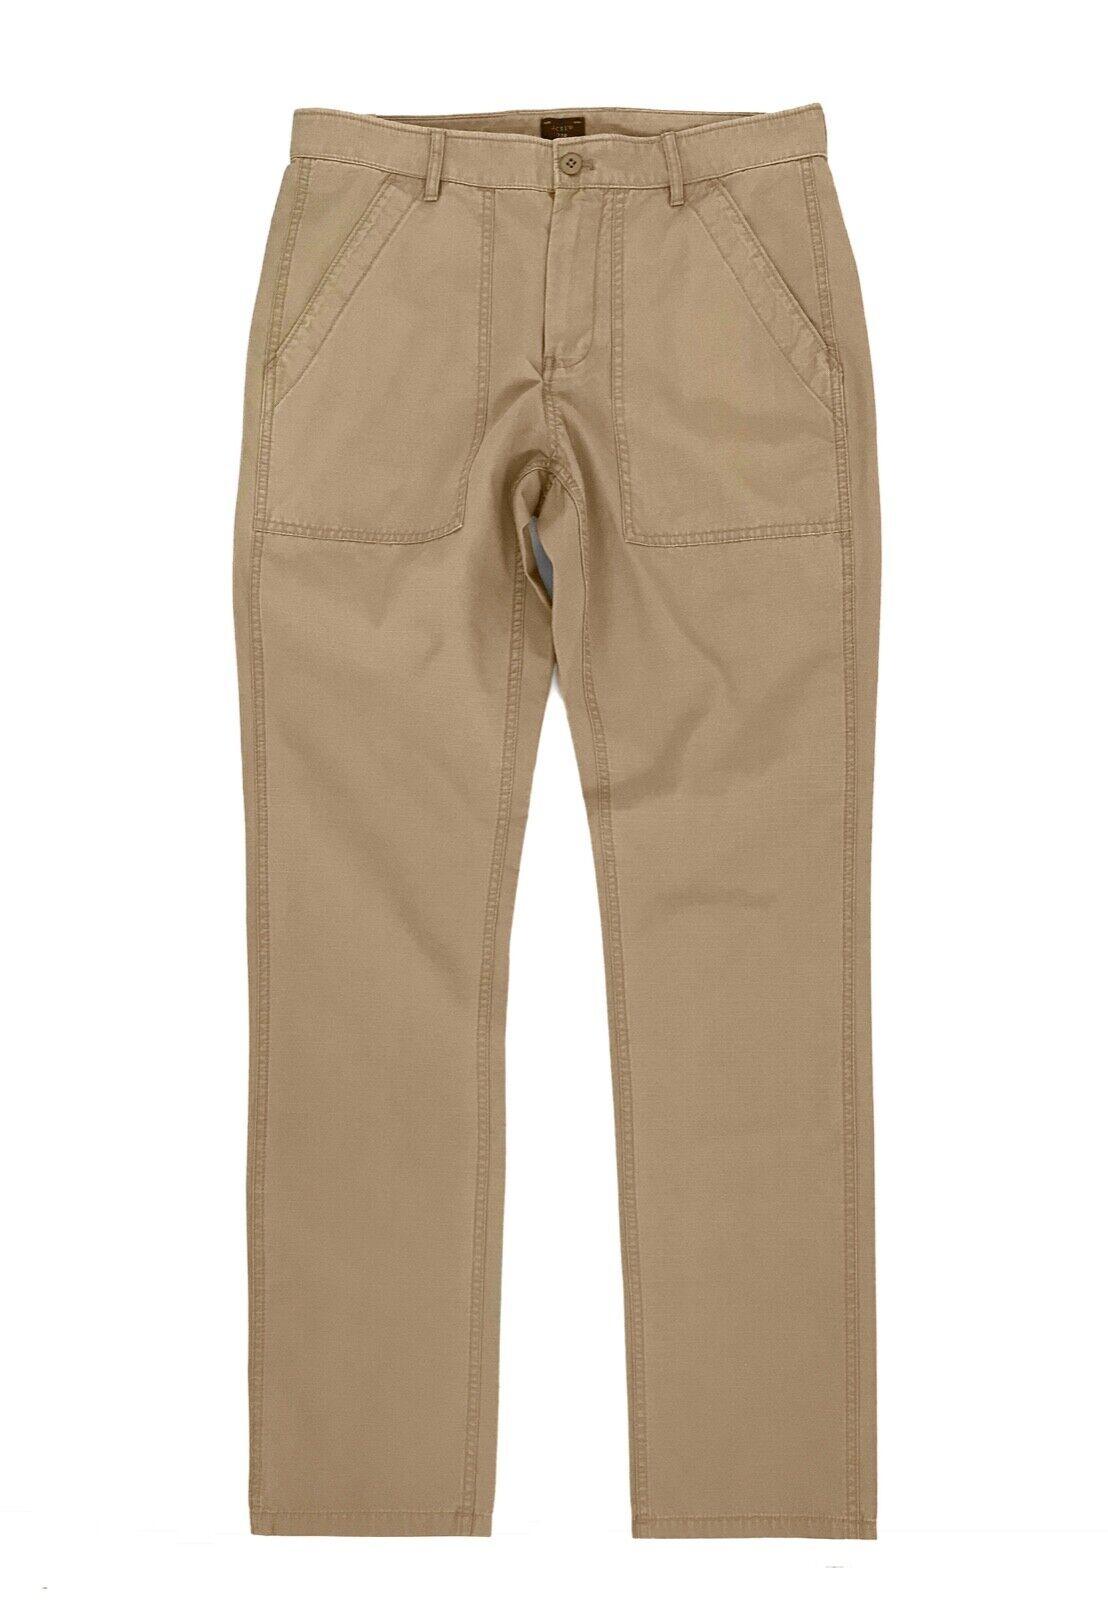 J.Crew Men's 34 32 - NWT - Light-Wt 770 Straight Fit Khaki Ripstop Camp Pants